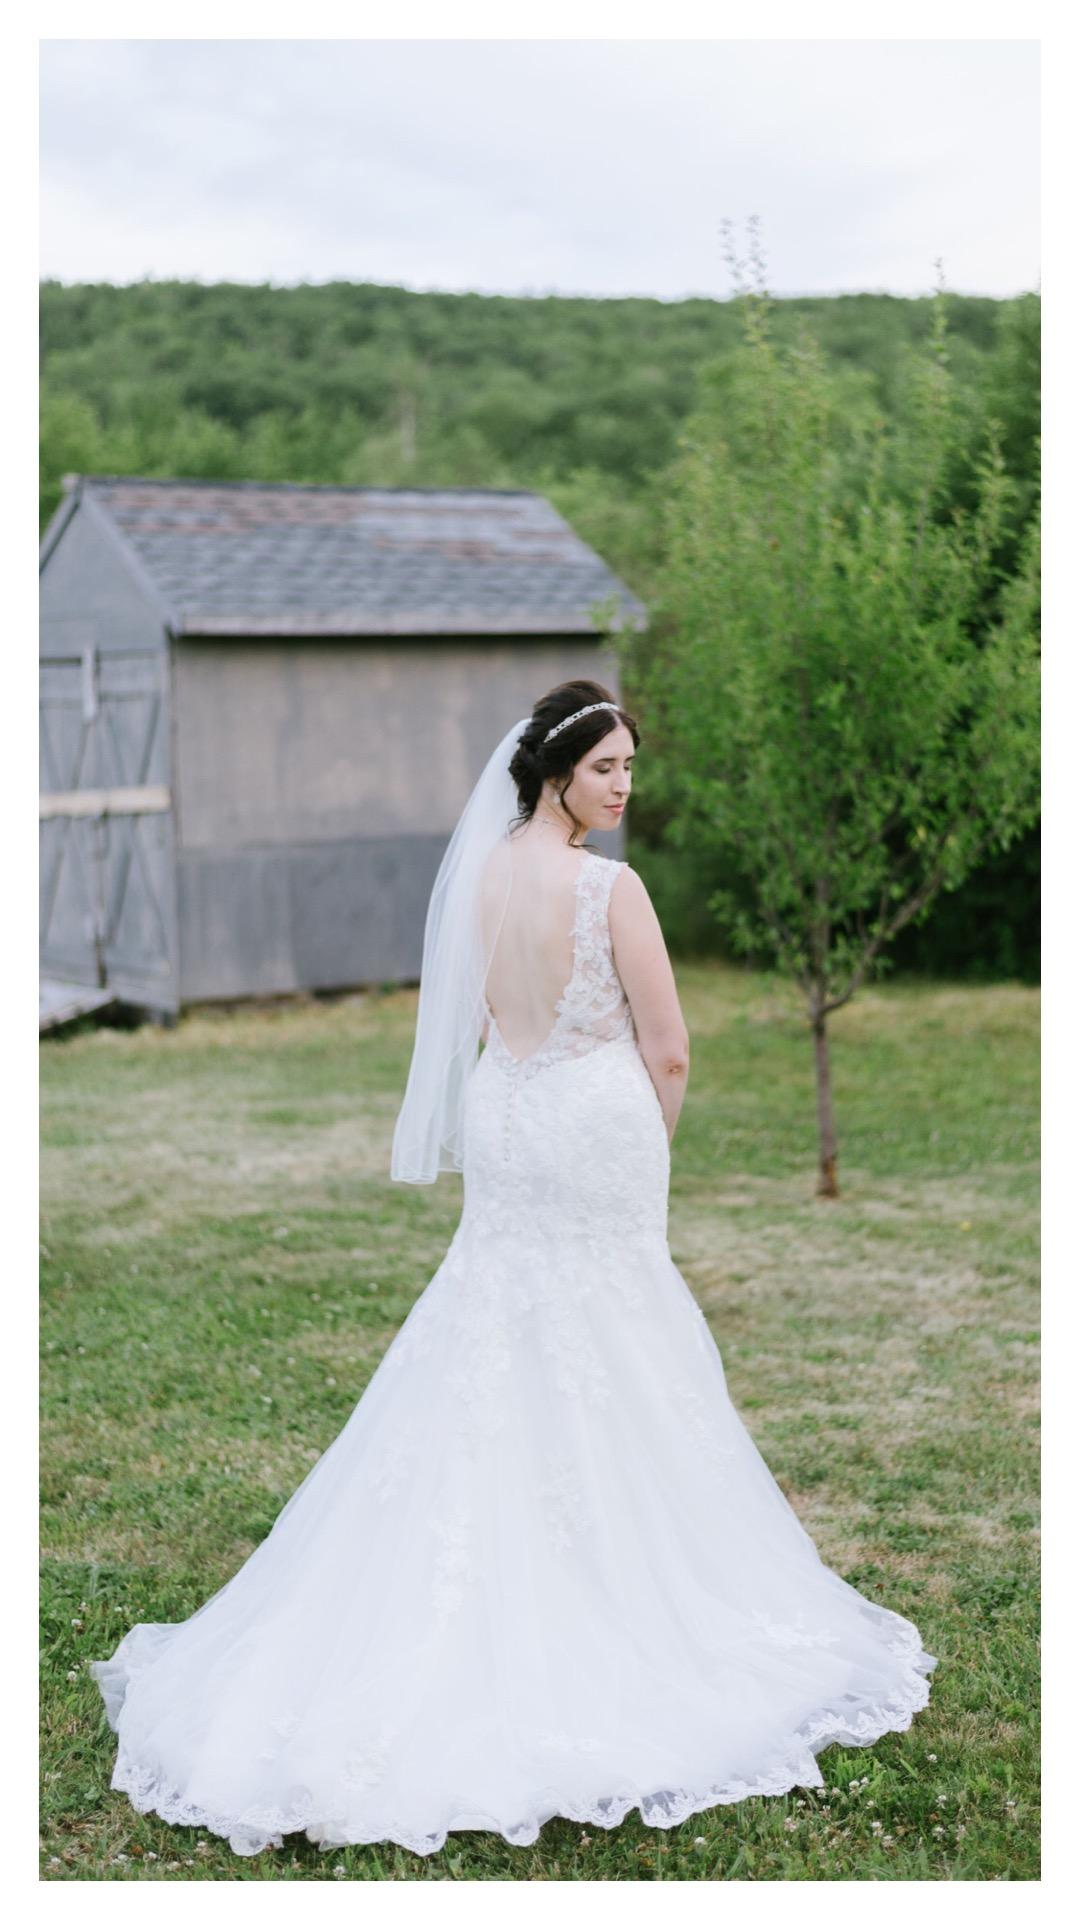 Kristy & Ryan's Rustic Winery Wedding | Halifax Wedding Photographer